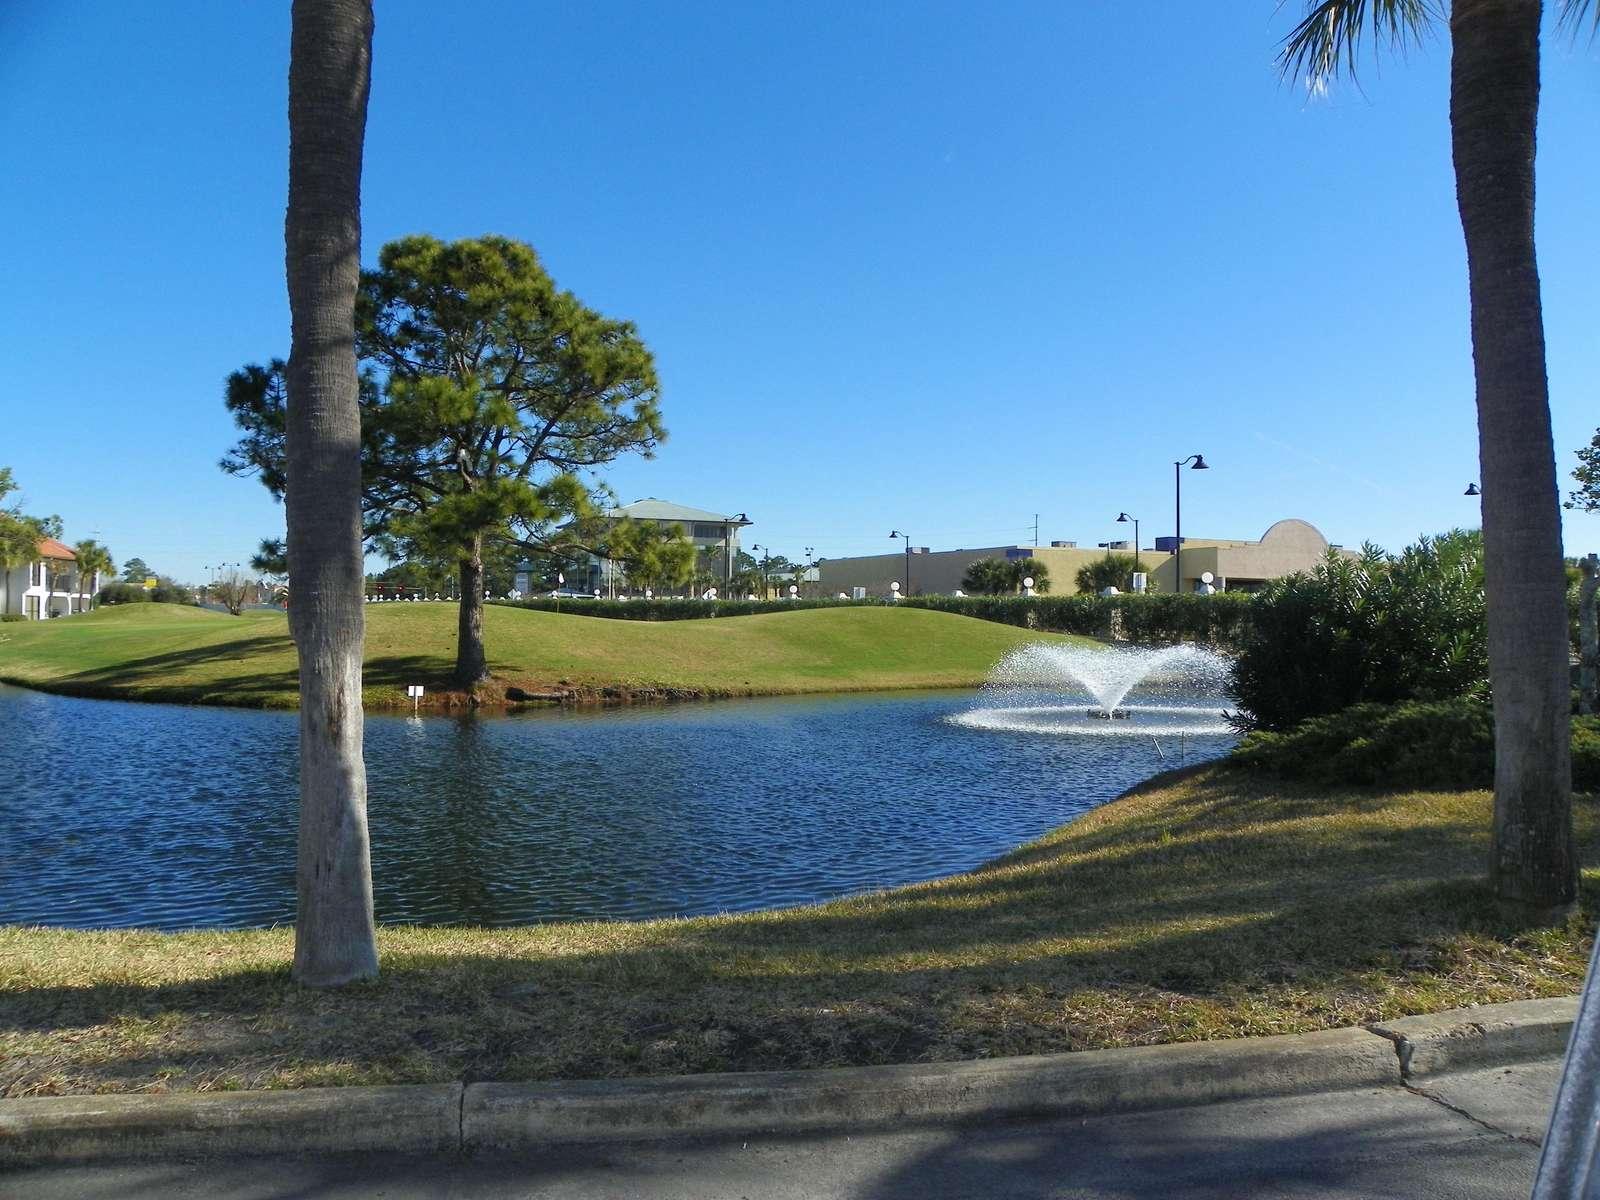 9 hole Par 3 course on site (add'l cost)